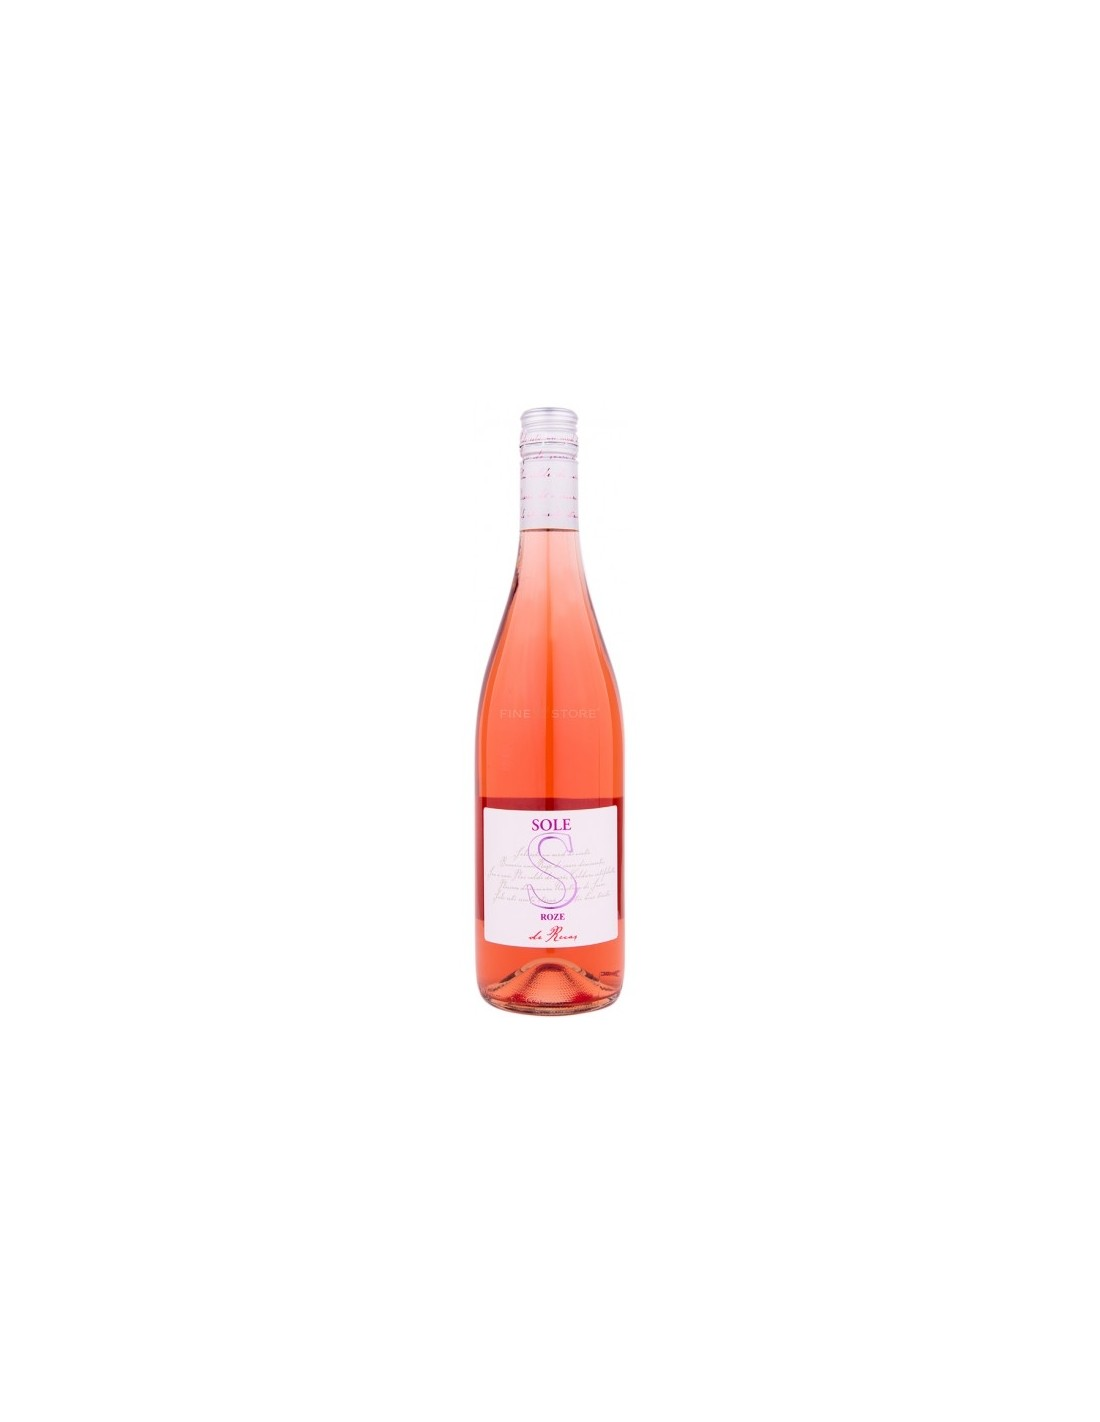 Vin roze sec, Sole Recas, 0.75L, 13.5% alc., Romania